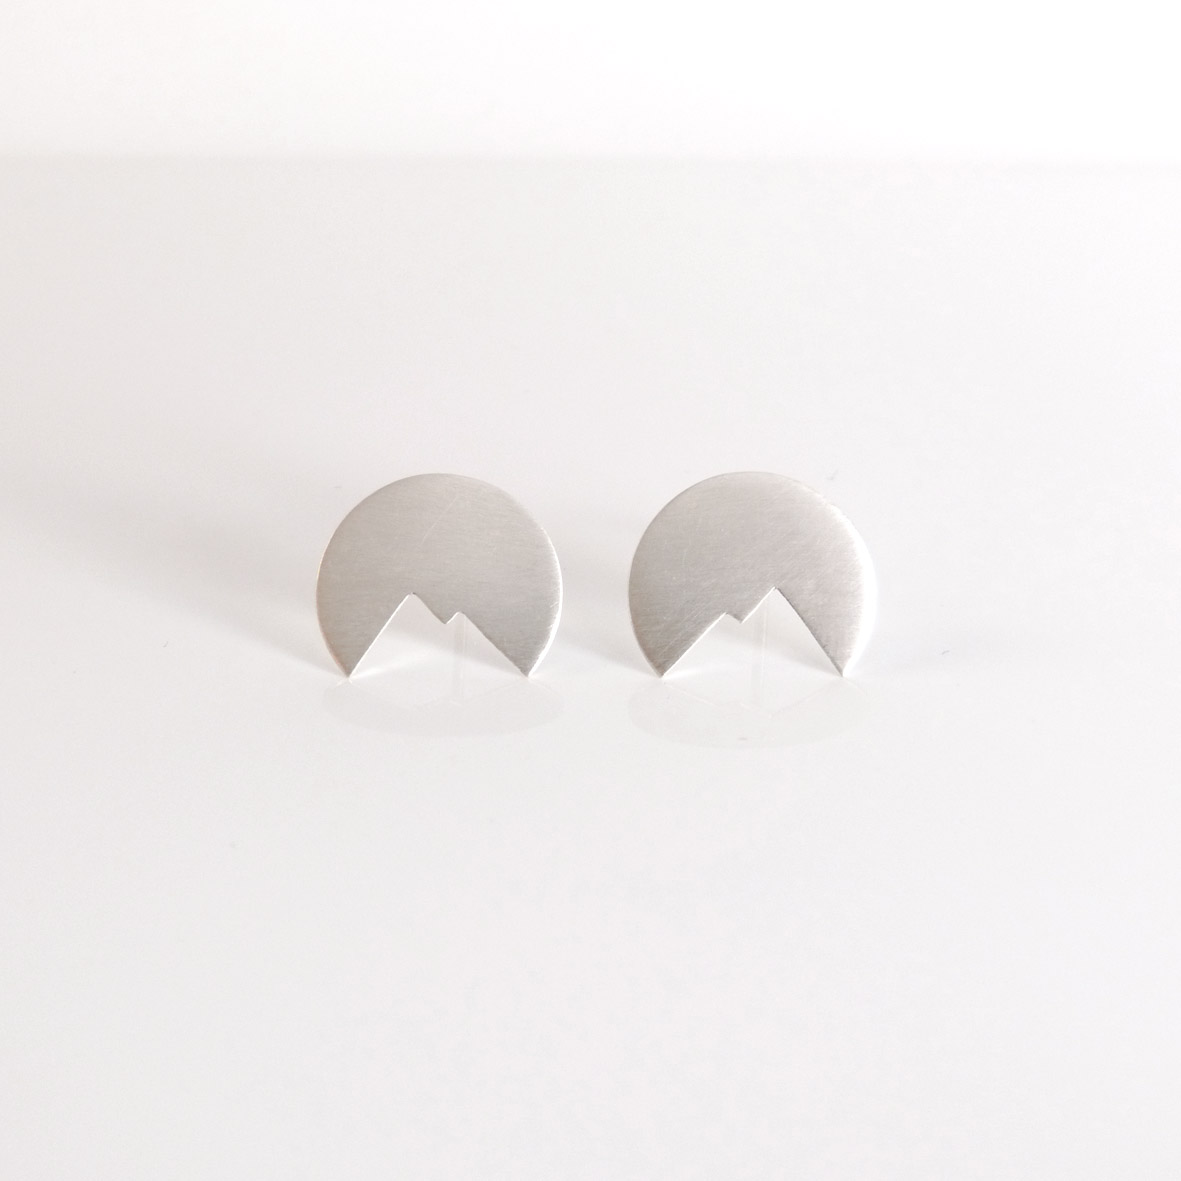 Moon and Mountain Earrings